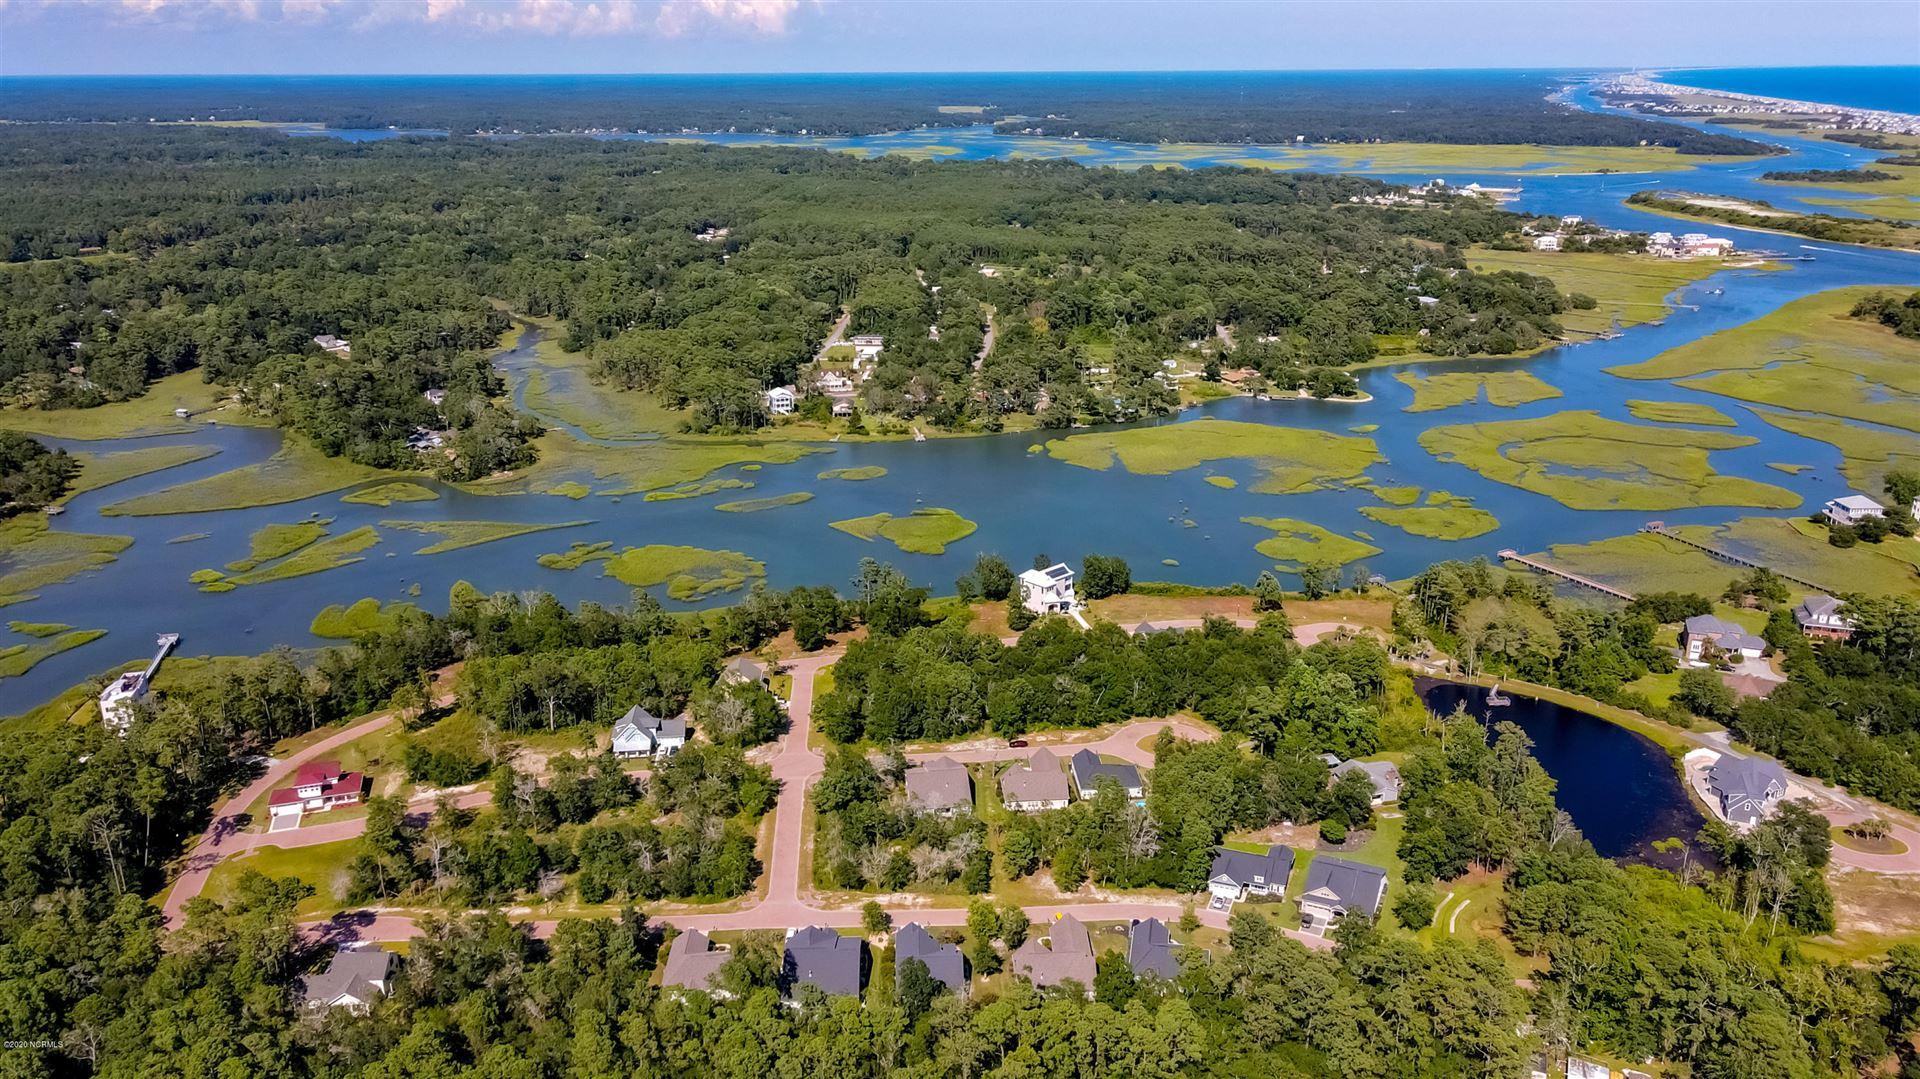 Photo of 4816 Island Walk Drive SW, Shallotte, NC 28470 (MLS # 100216908)